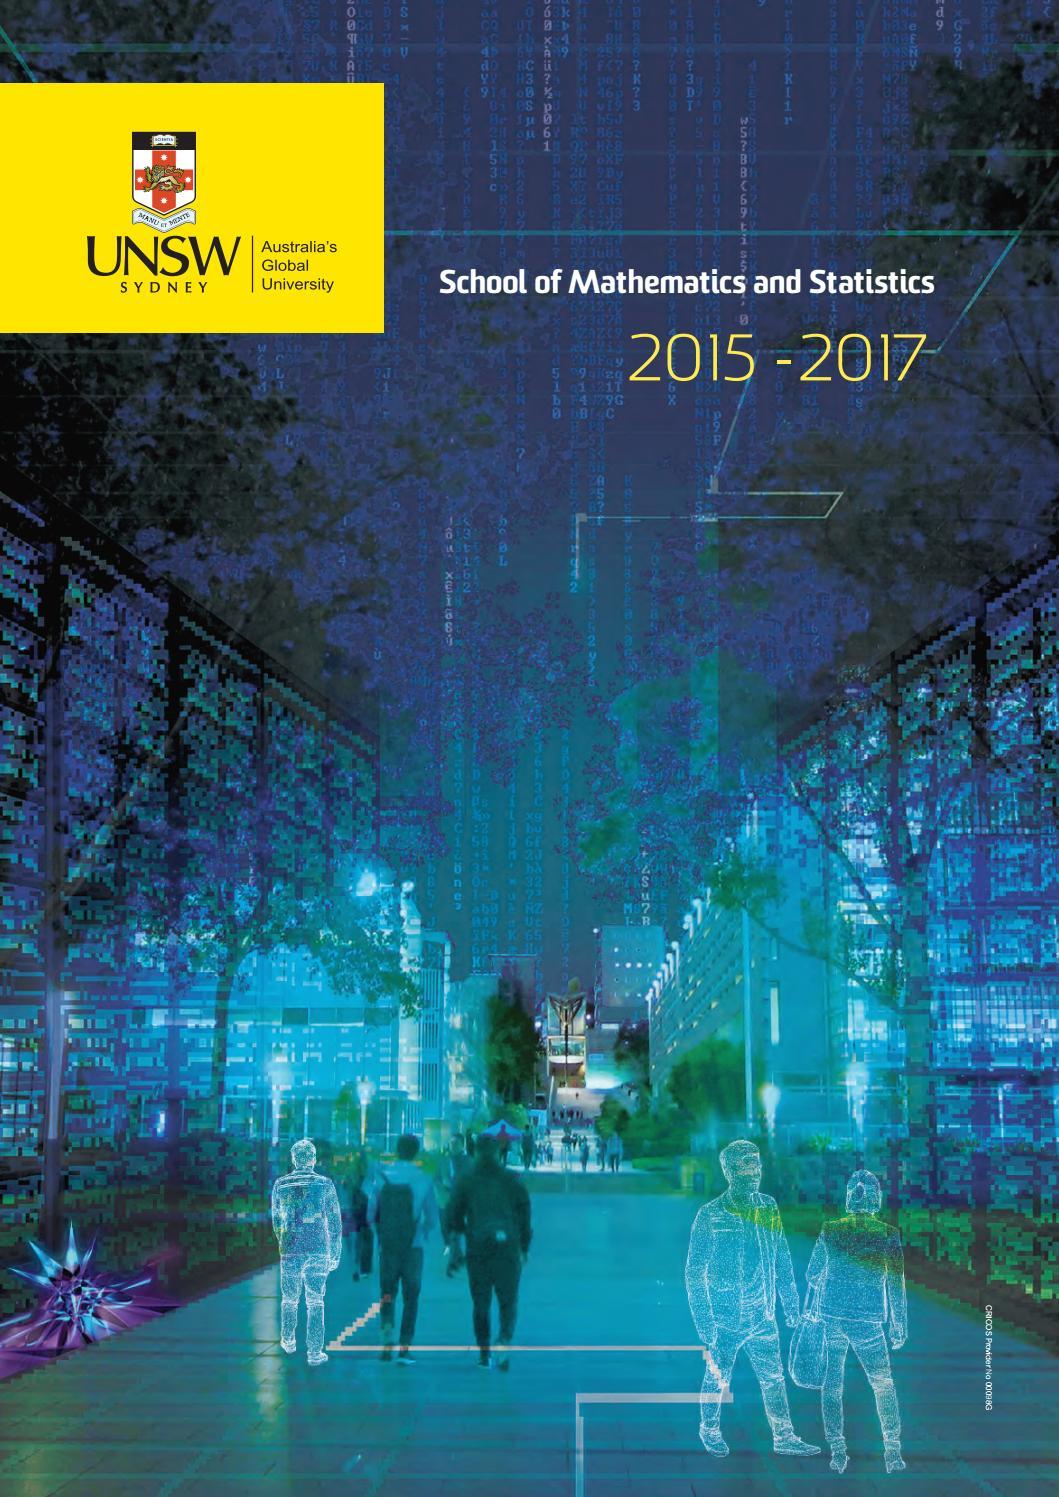 UNSW School of Mathematics & Statistics 2015-2017 by